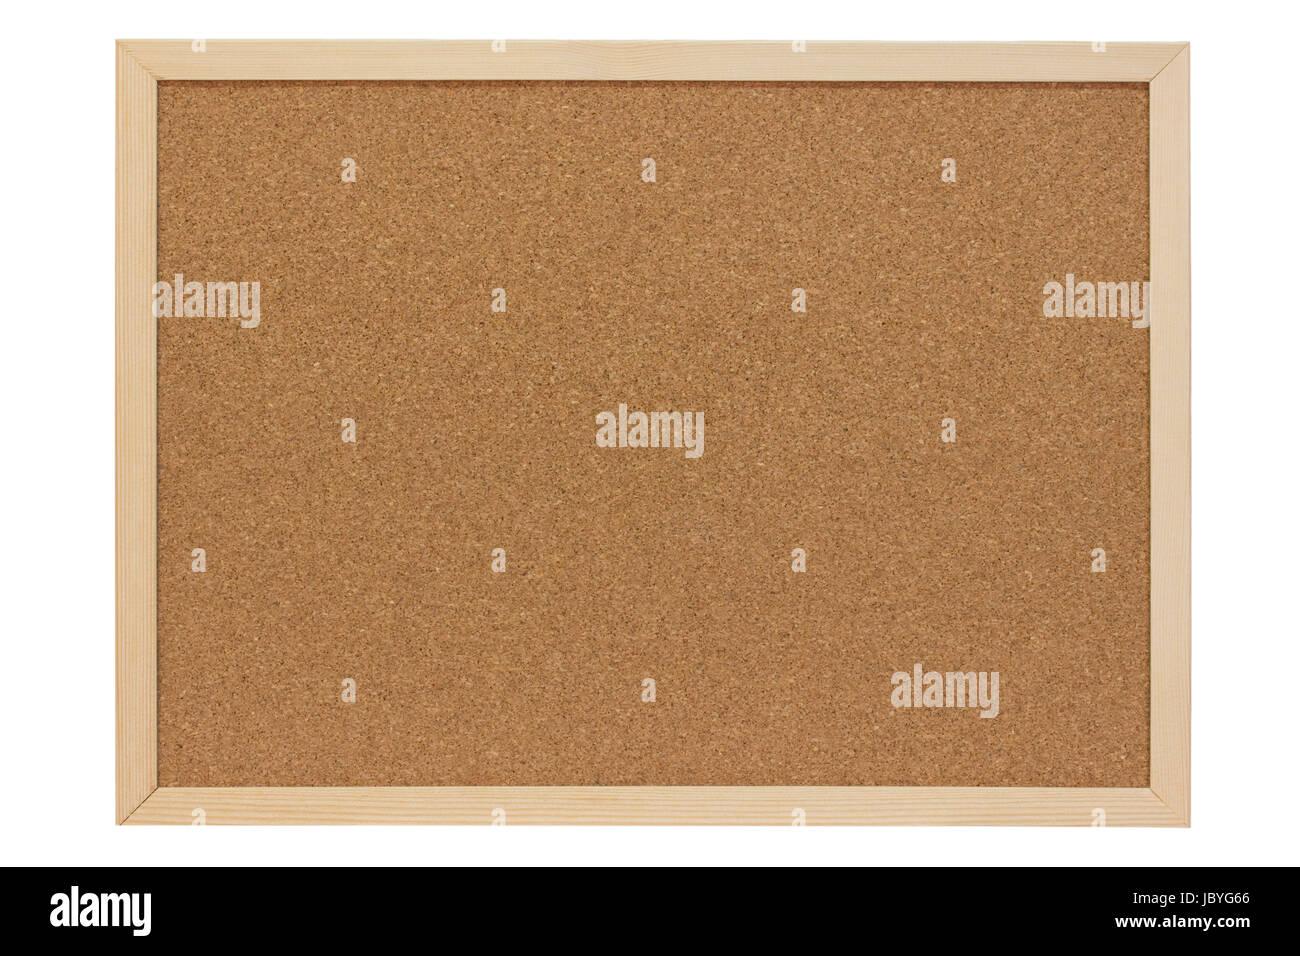 Pinnwand aus Kork mit Holzrahmen - freigestellt Stock Photo ...